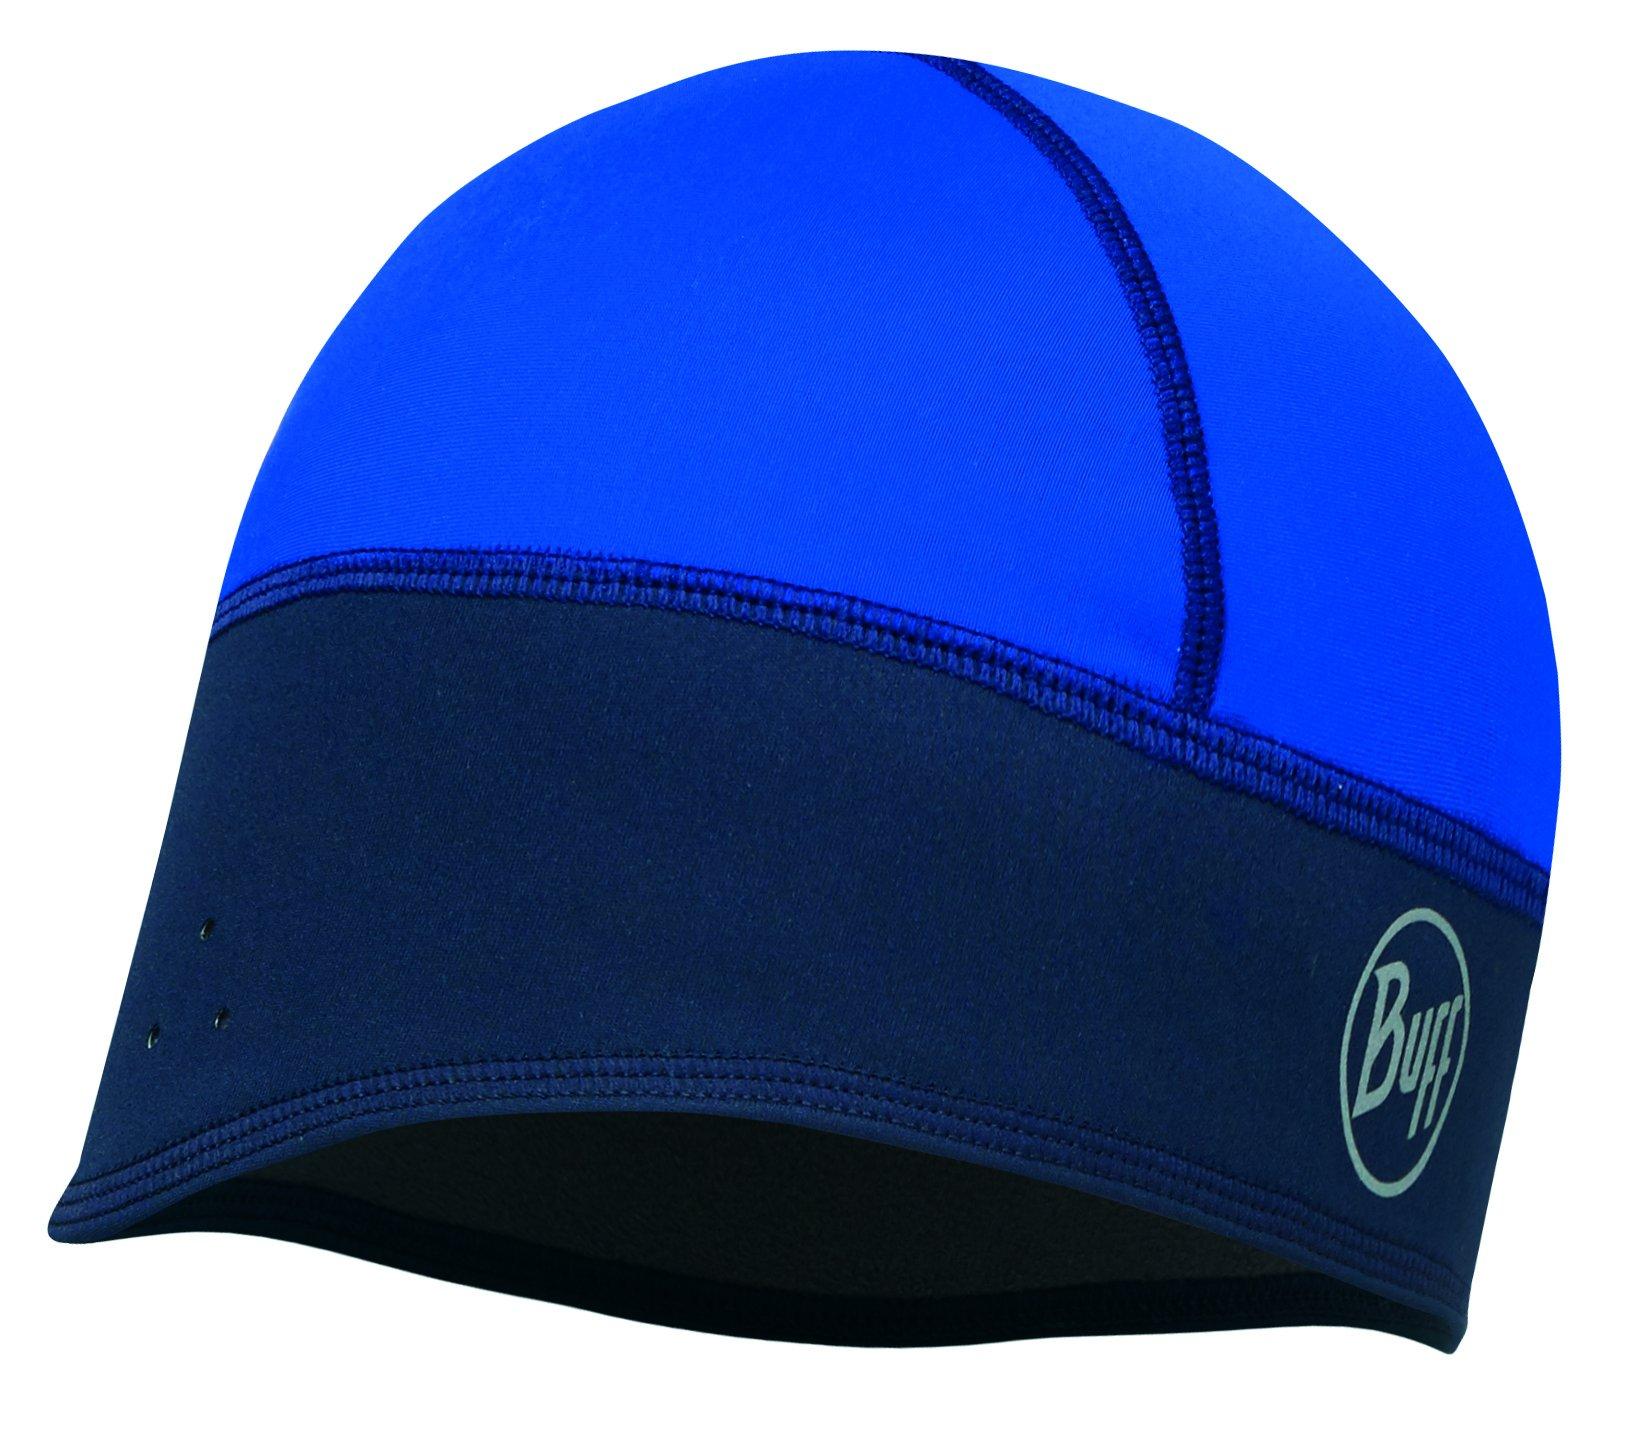 Buff Kopfbedeckungen, Windproof Tech FleeceBlau, Erwachsene / One Size